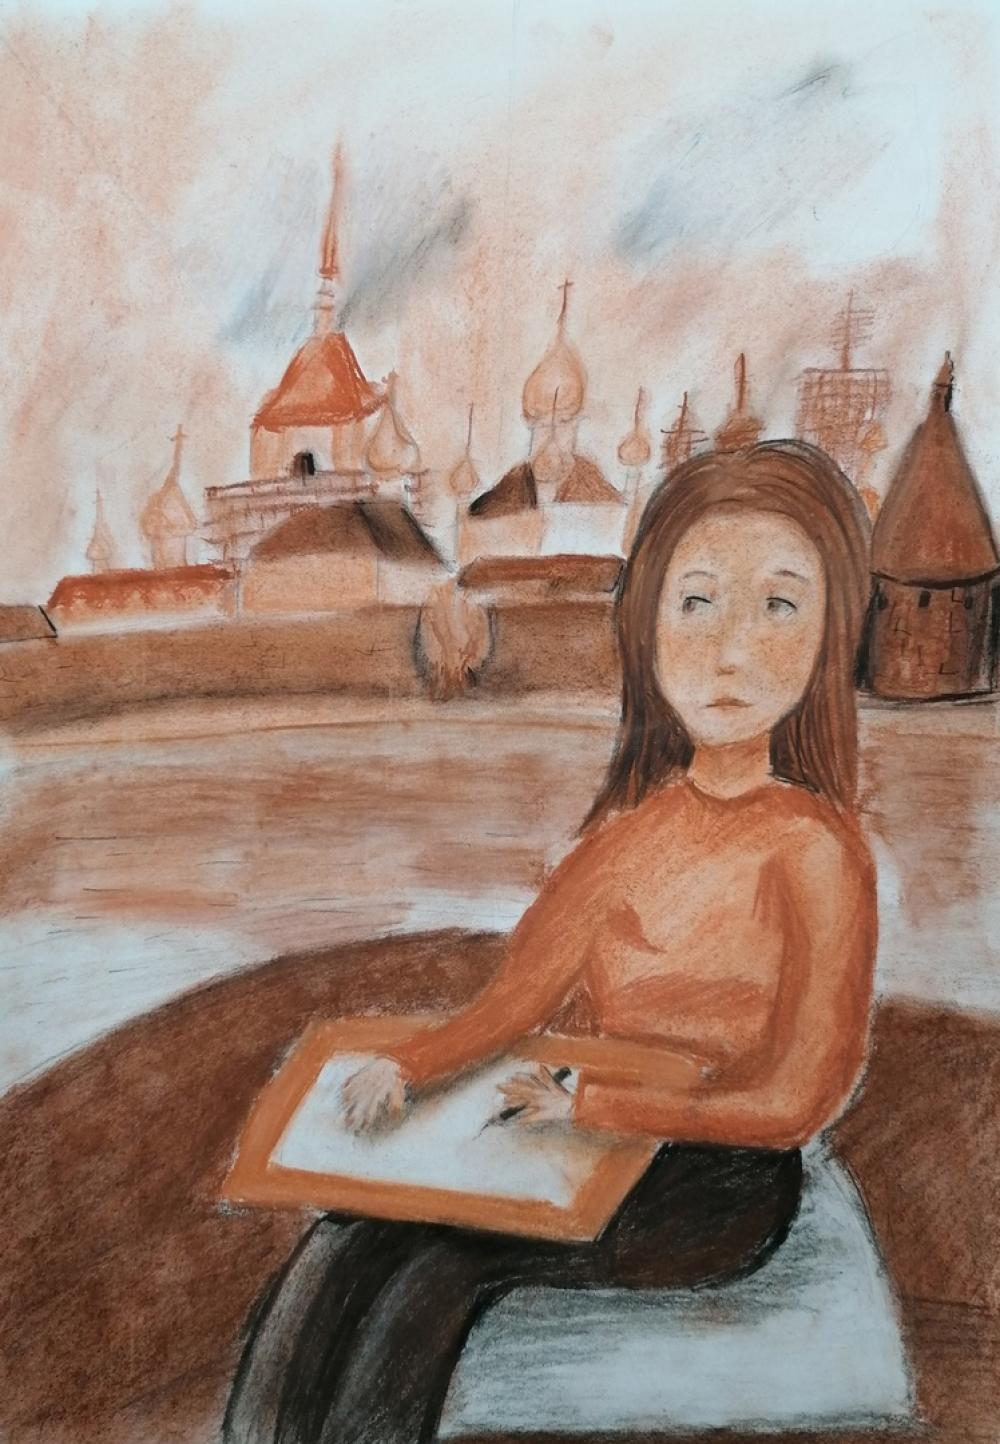 Даниелян Наре, 11 лет, «На пленэре»